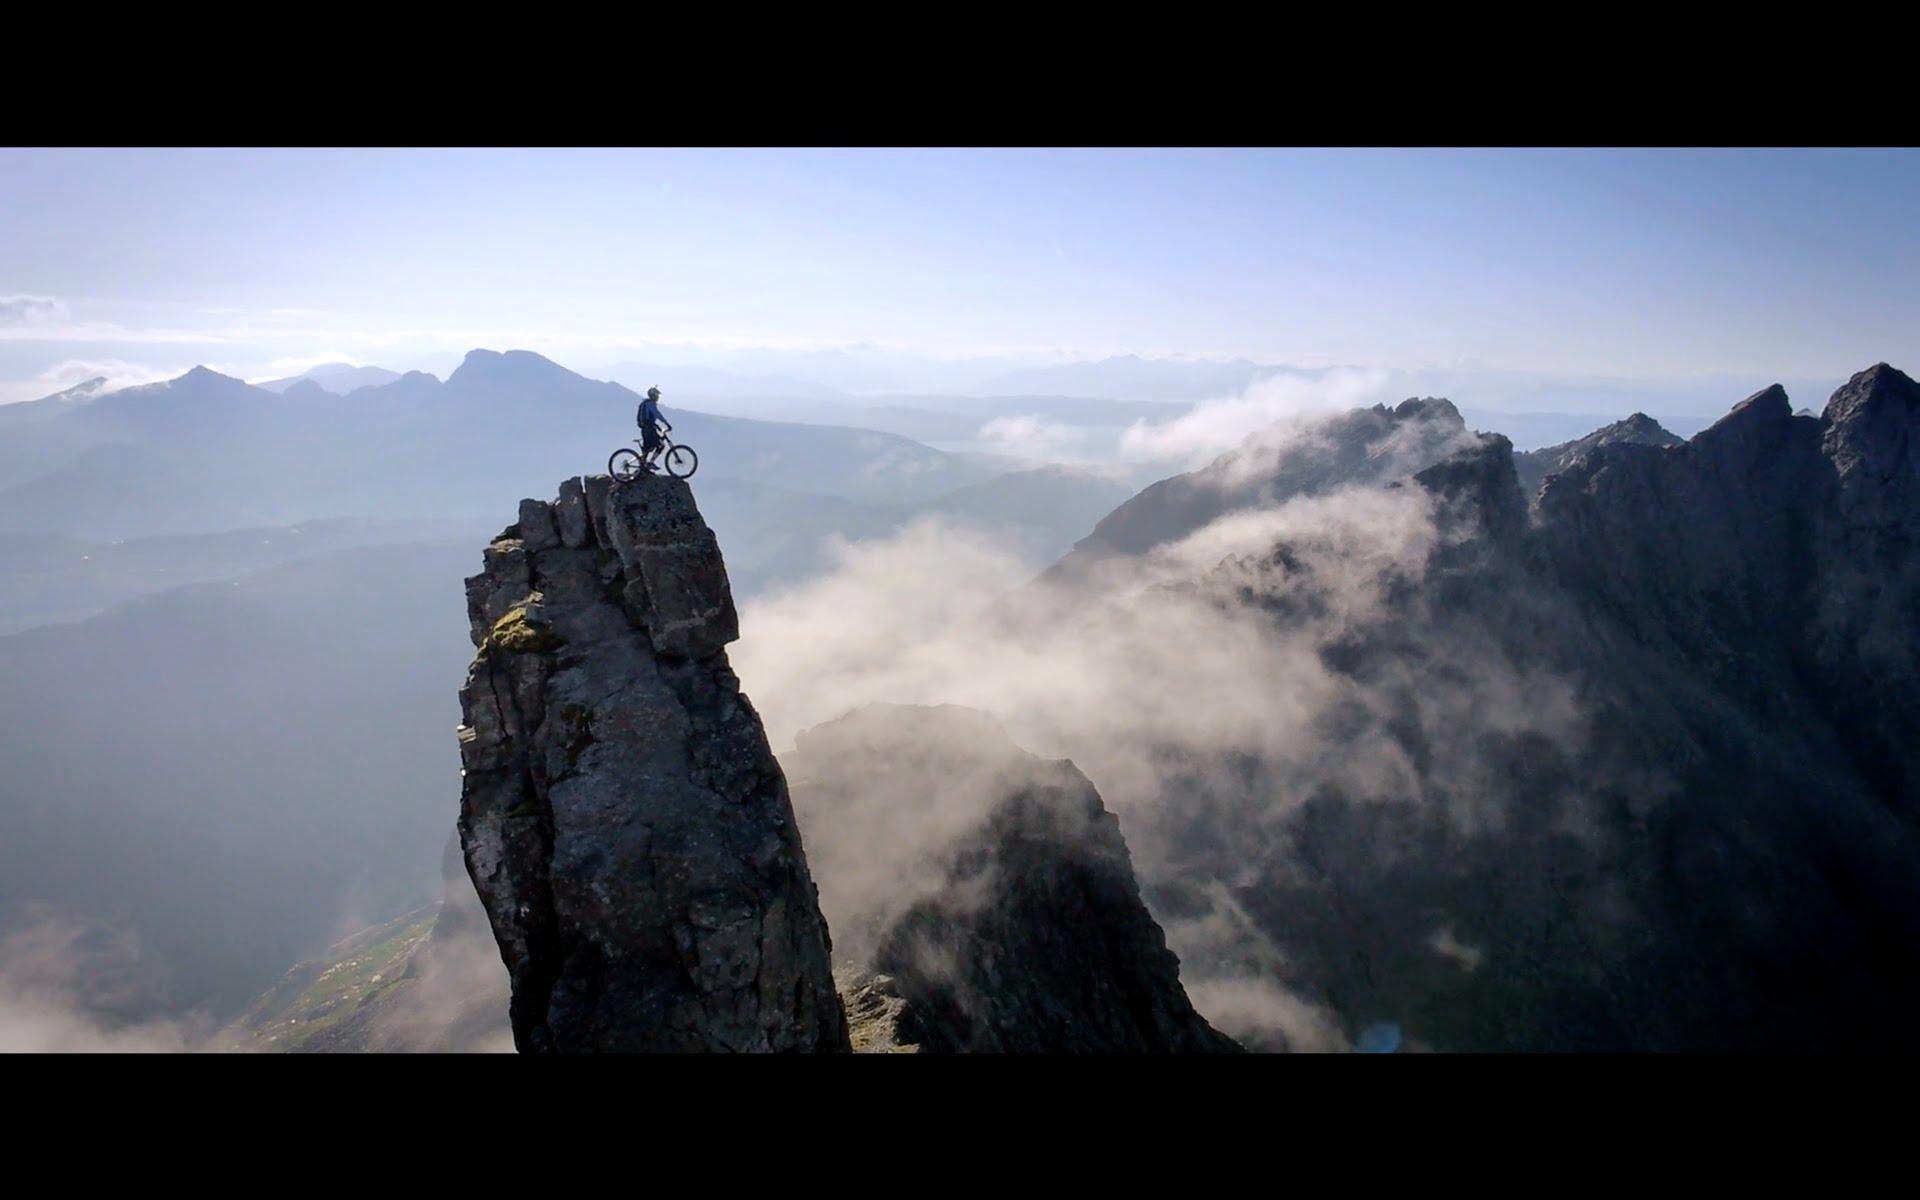 Danny Macaskill: The Ridge – Grosse vidéo